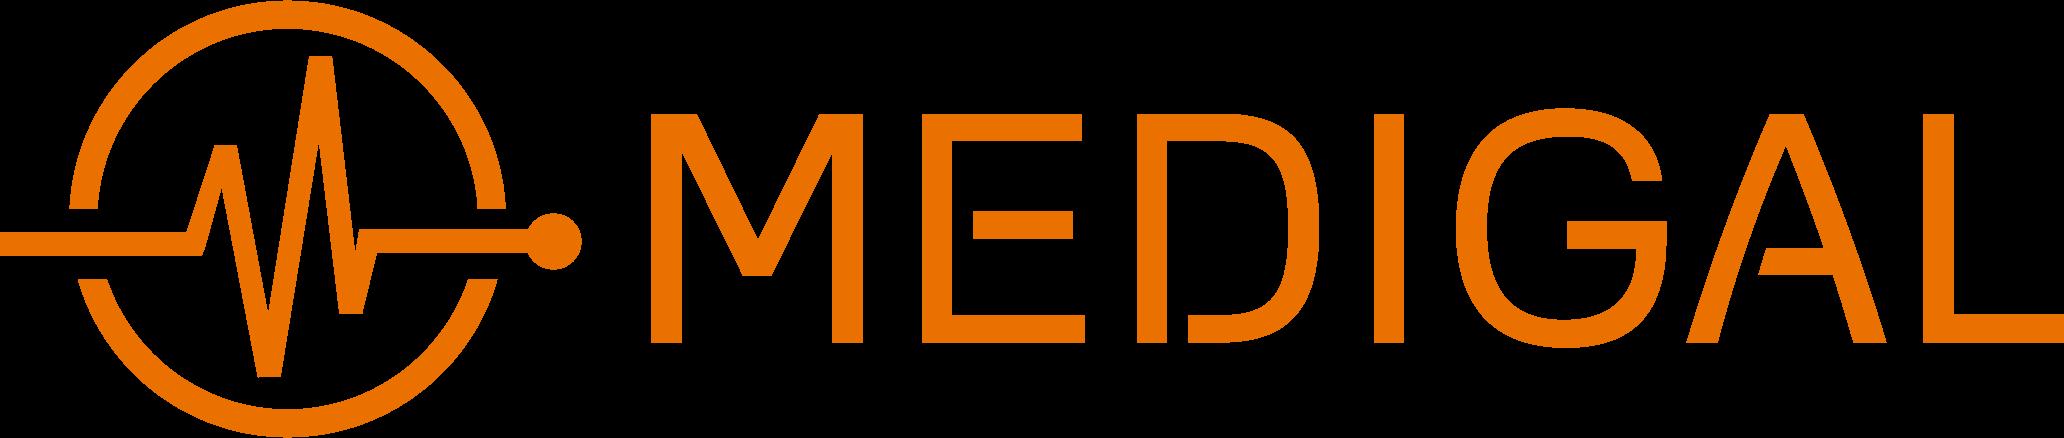 Bel Medigal Beograd